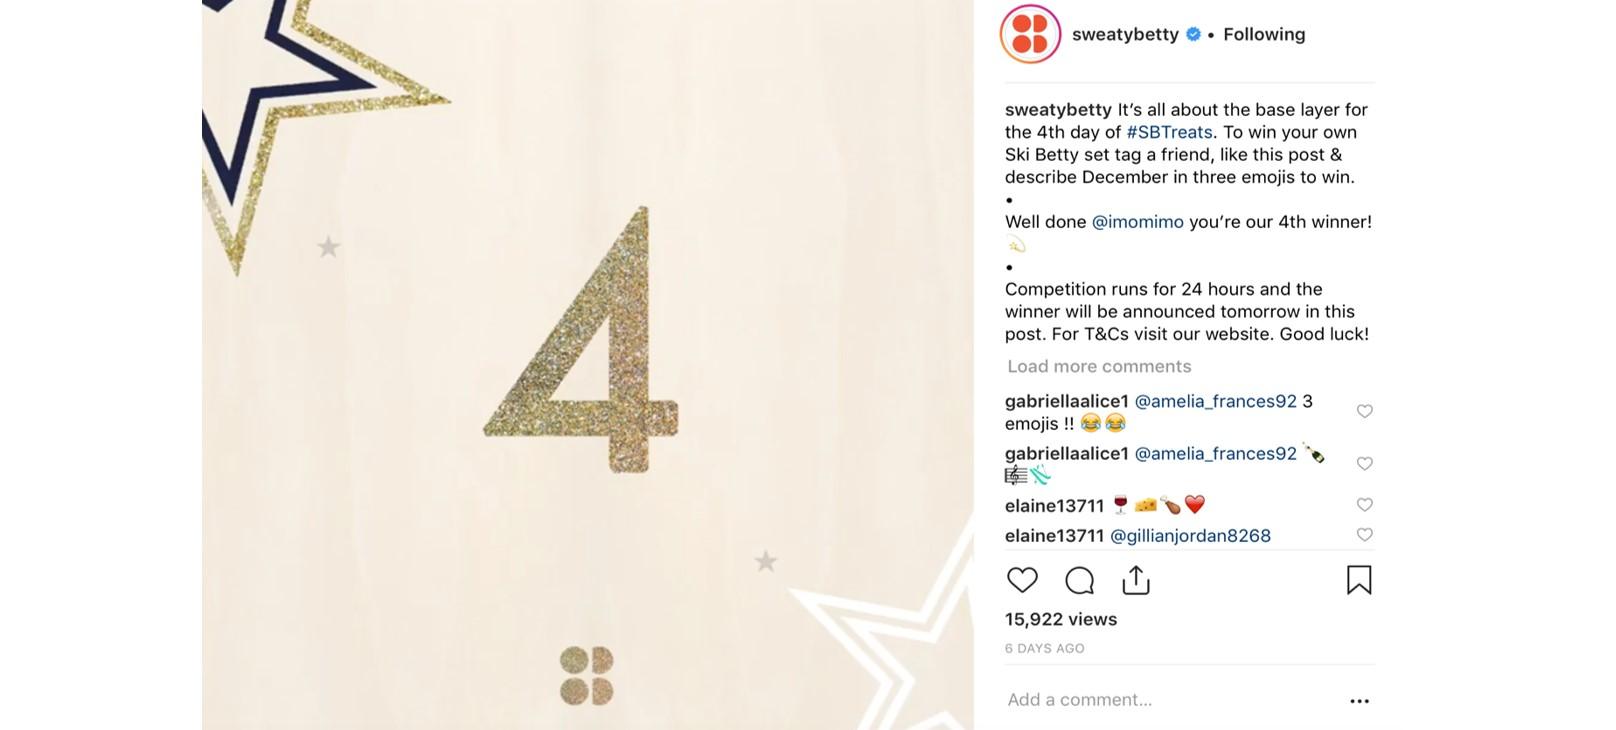 sweatybetty Instagram post